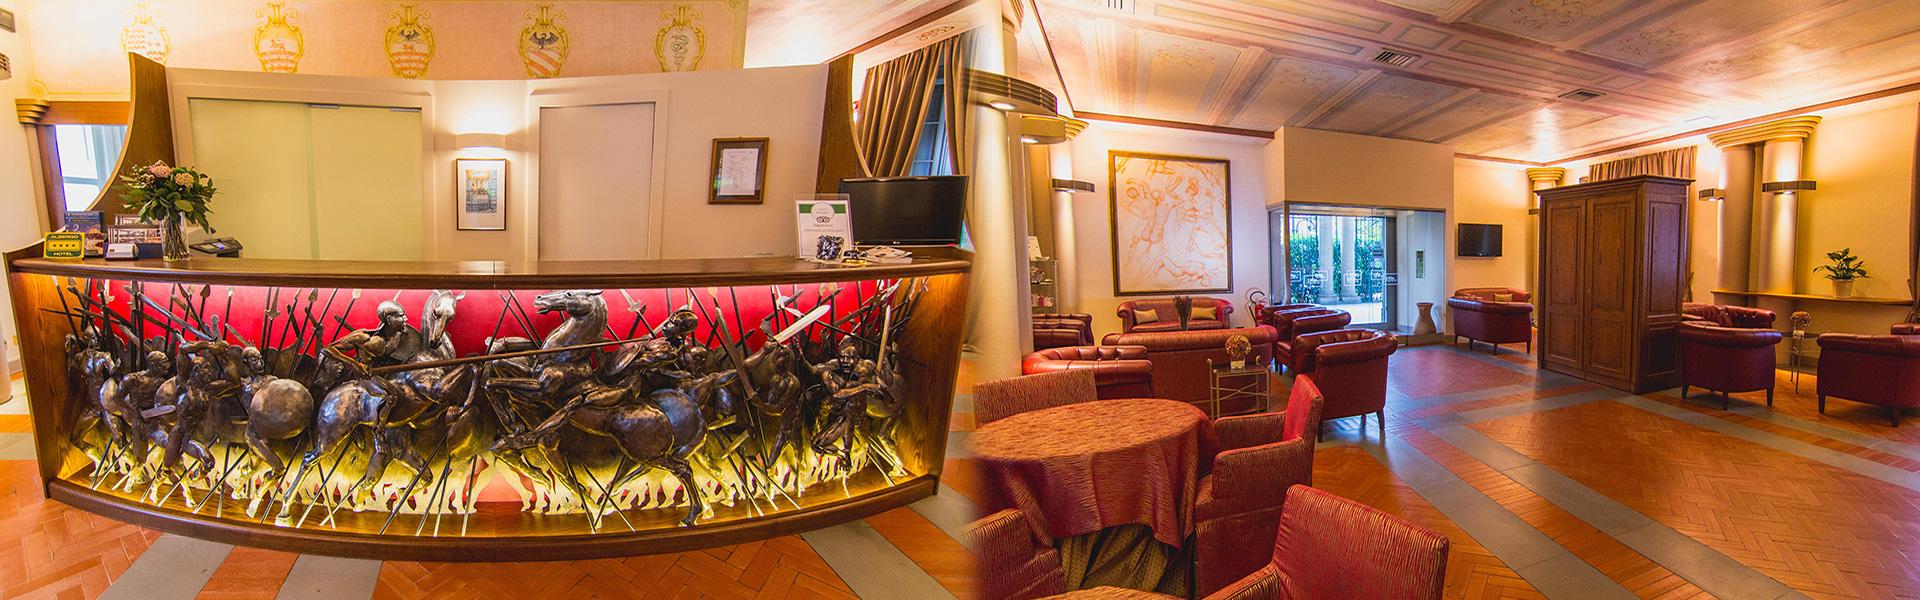 nuova-hall-reception-hotel-parco-borromeo-cesano-maderno